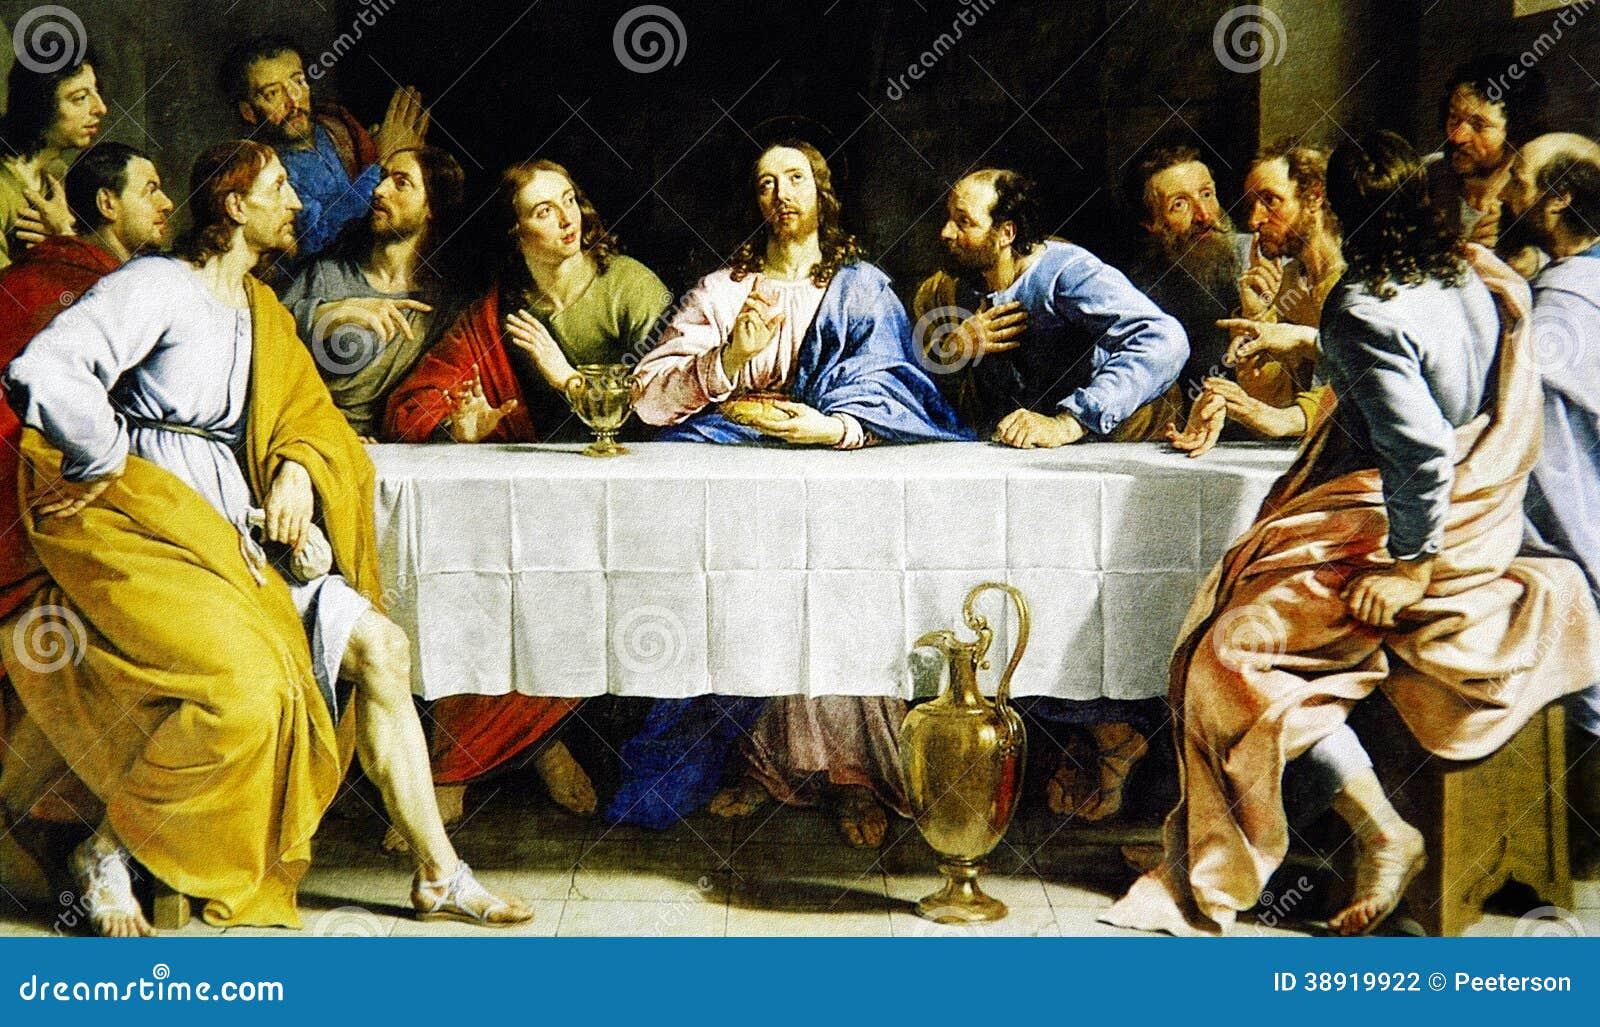 Le dernier dîner